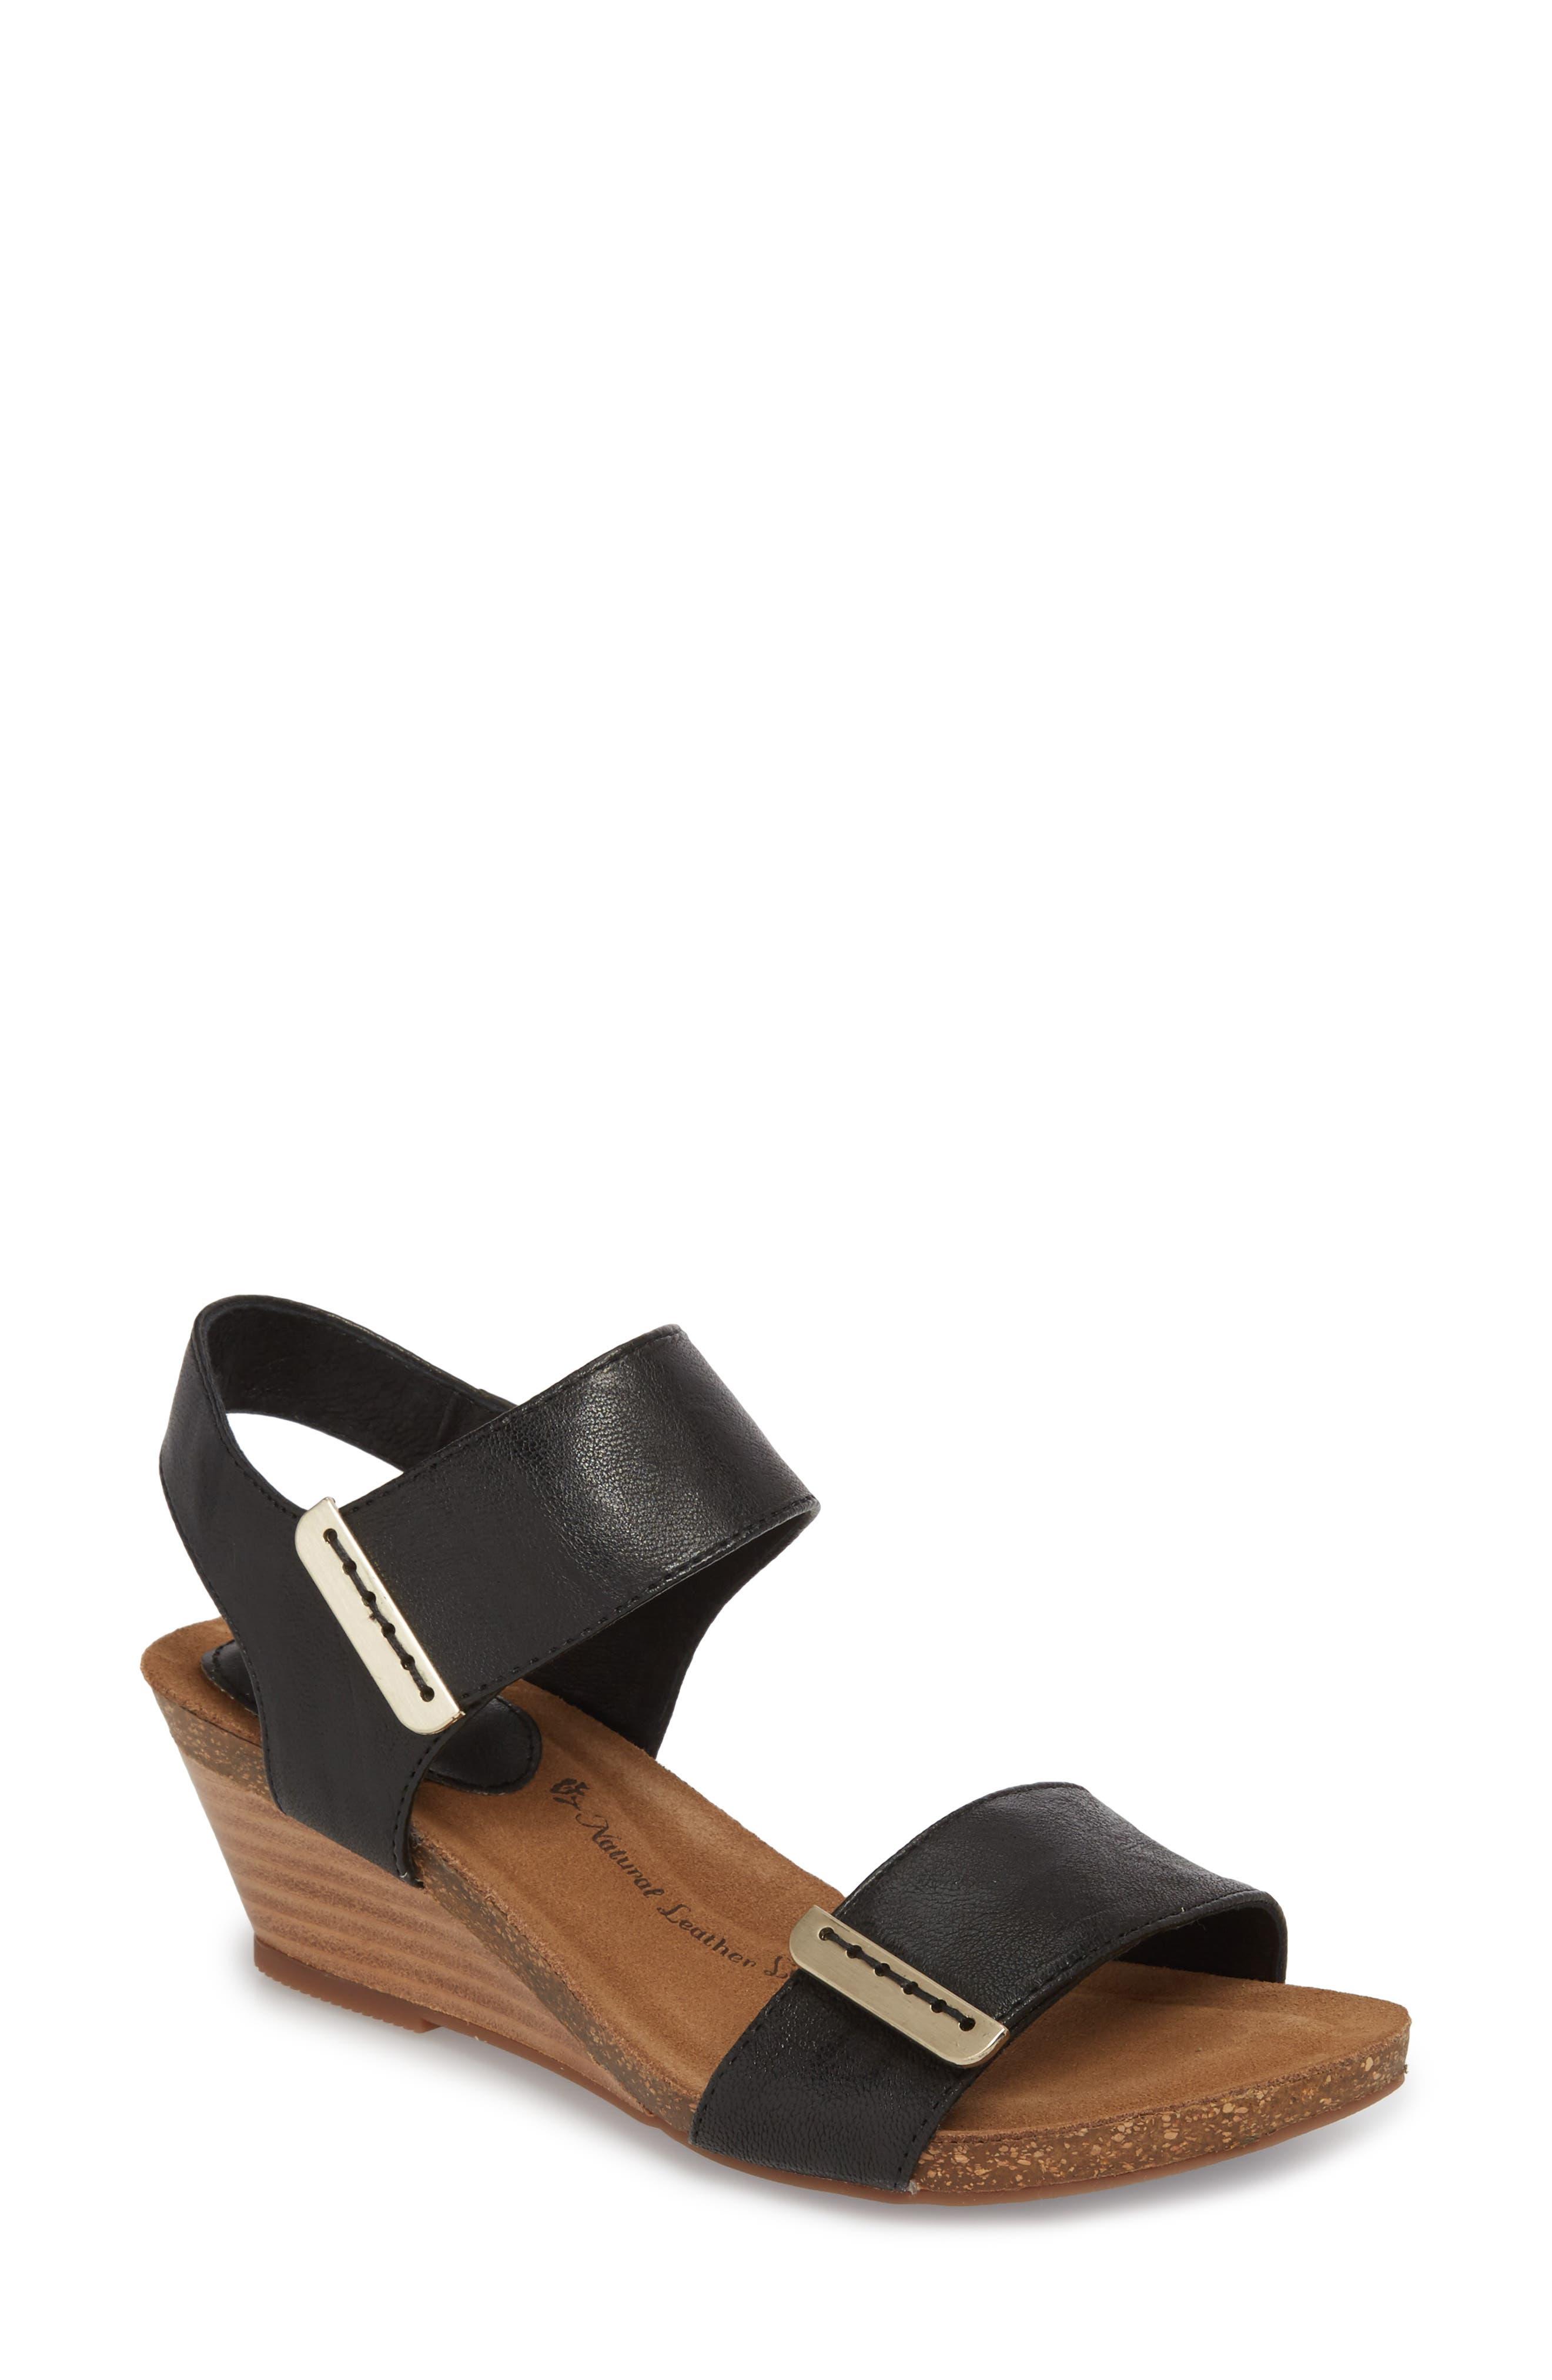 Verdi Wedge Sandal,                         Main,                         color, Black Leather